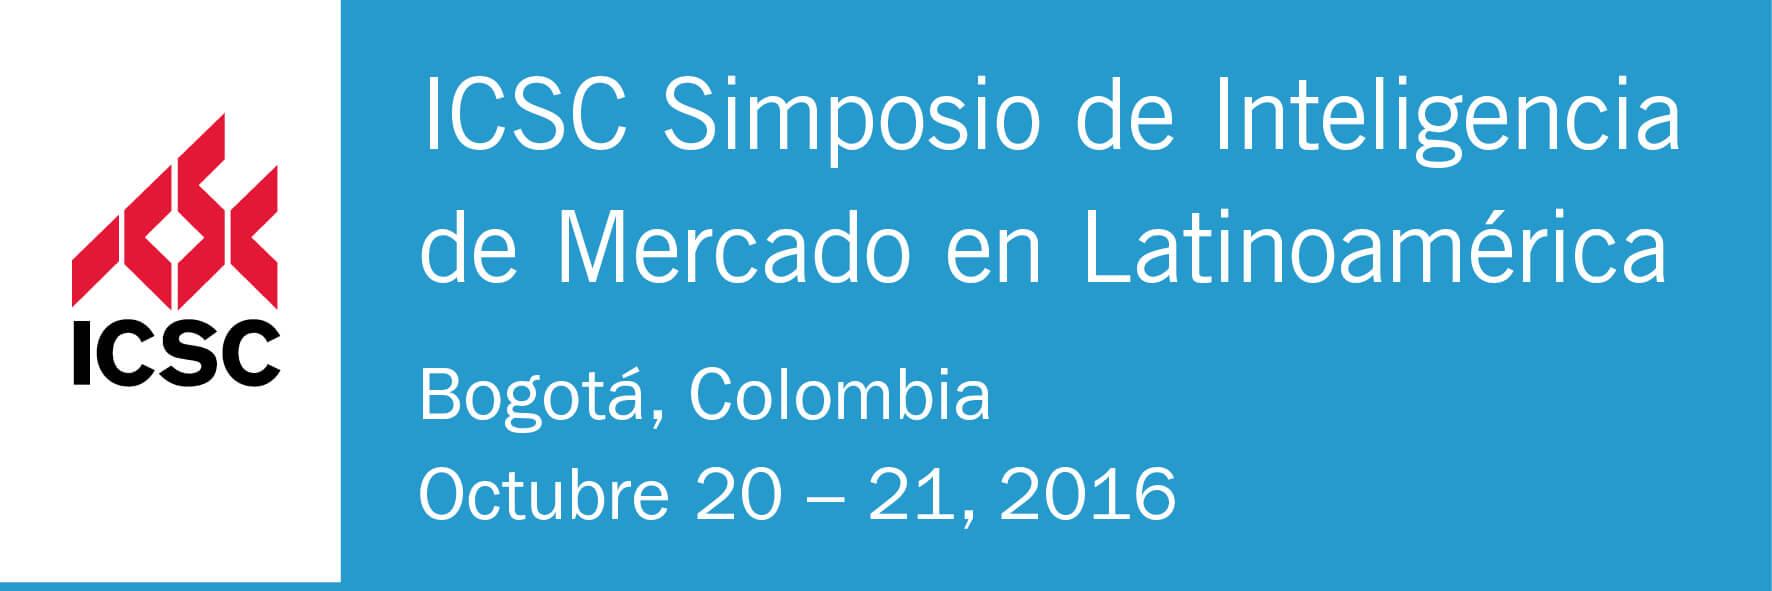 ICSC Neuromobile Colombia Retail Centros Comerciales